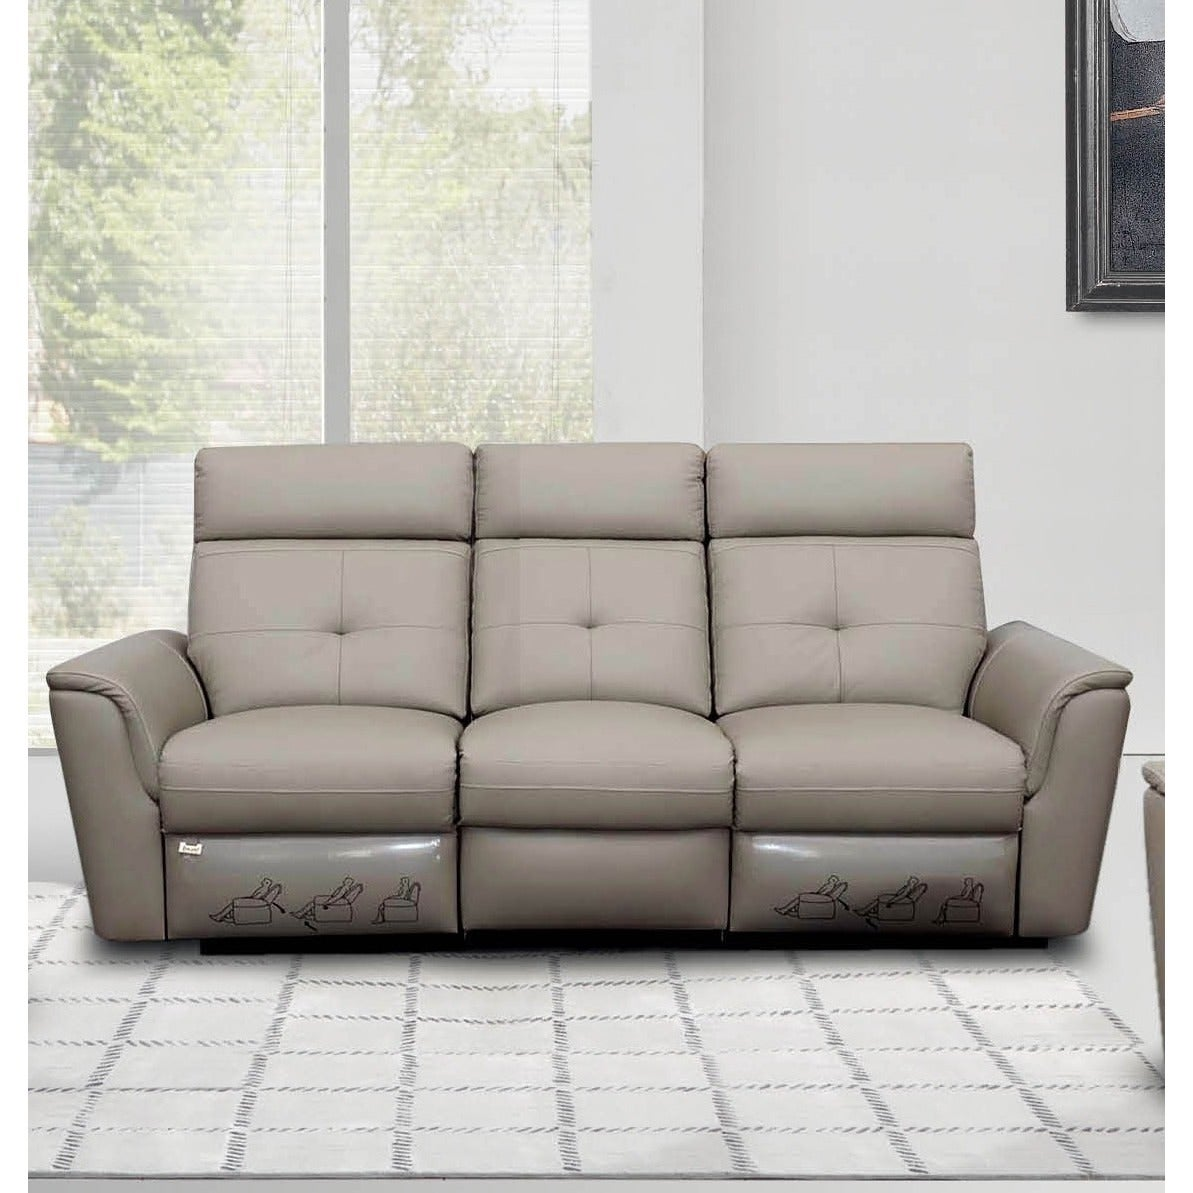 Shop luca home light grey contemporary manual reclining sofa free shipping today overstock com 10136122